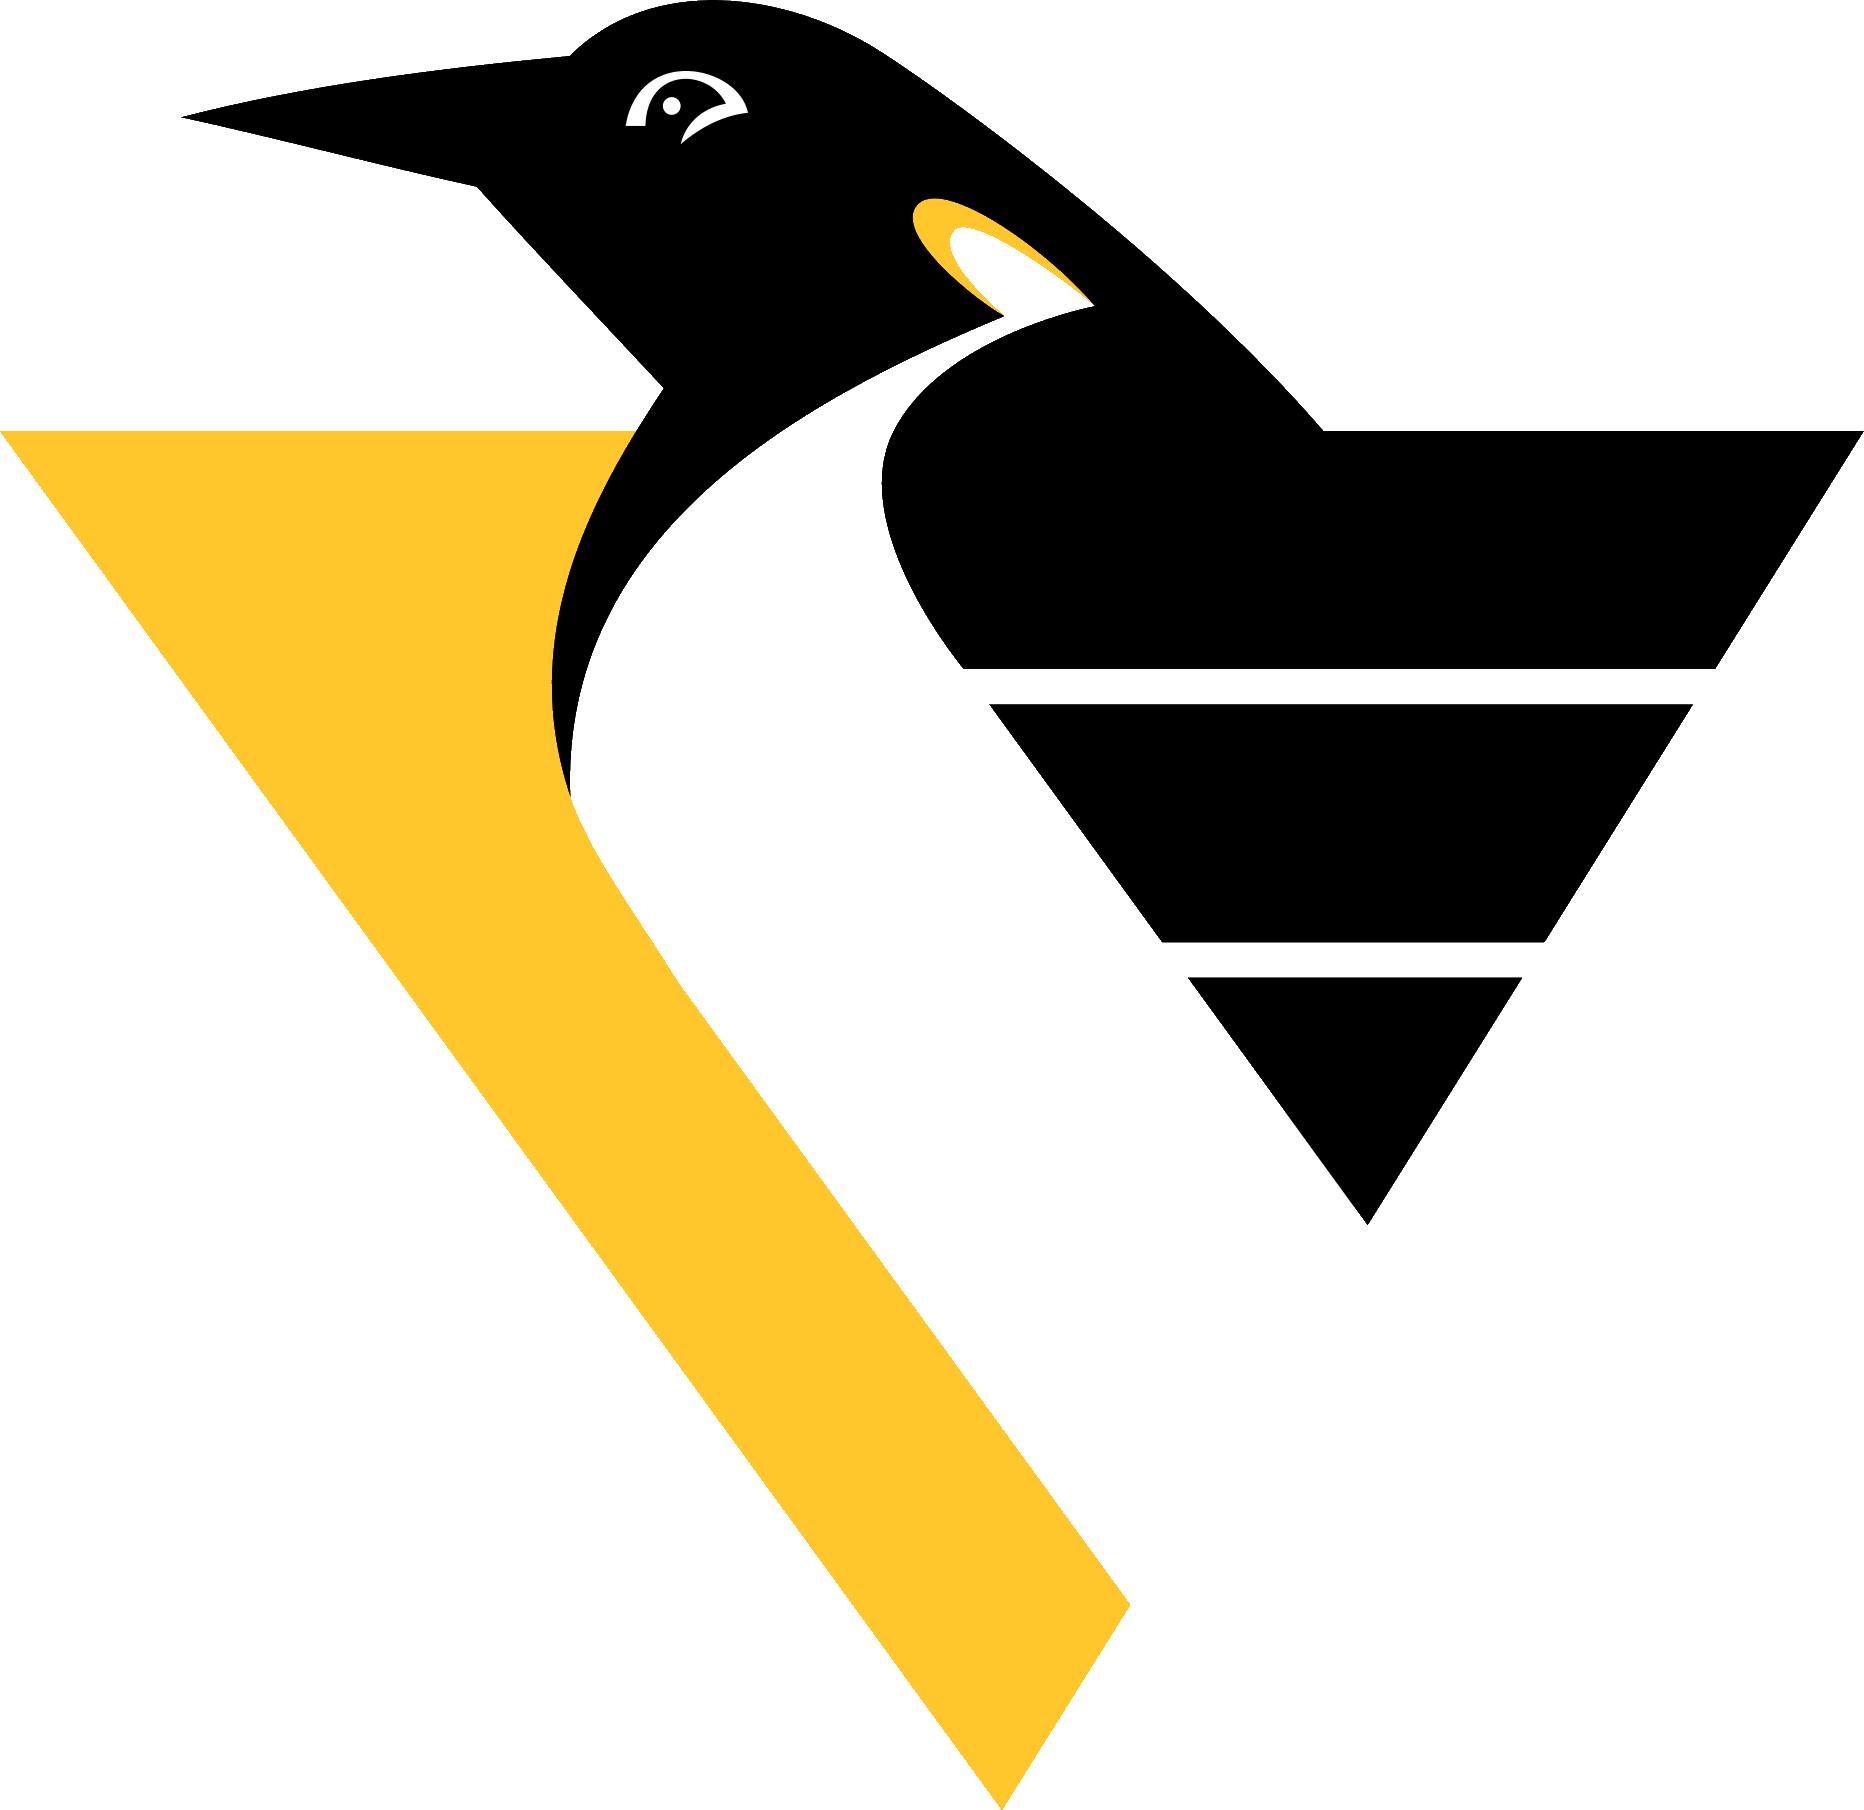 Penguin group logo png - photo#10